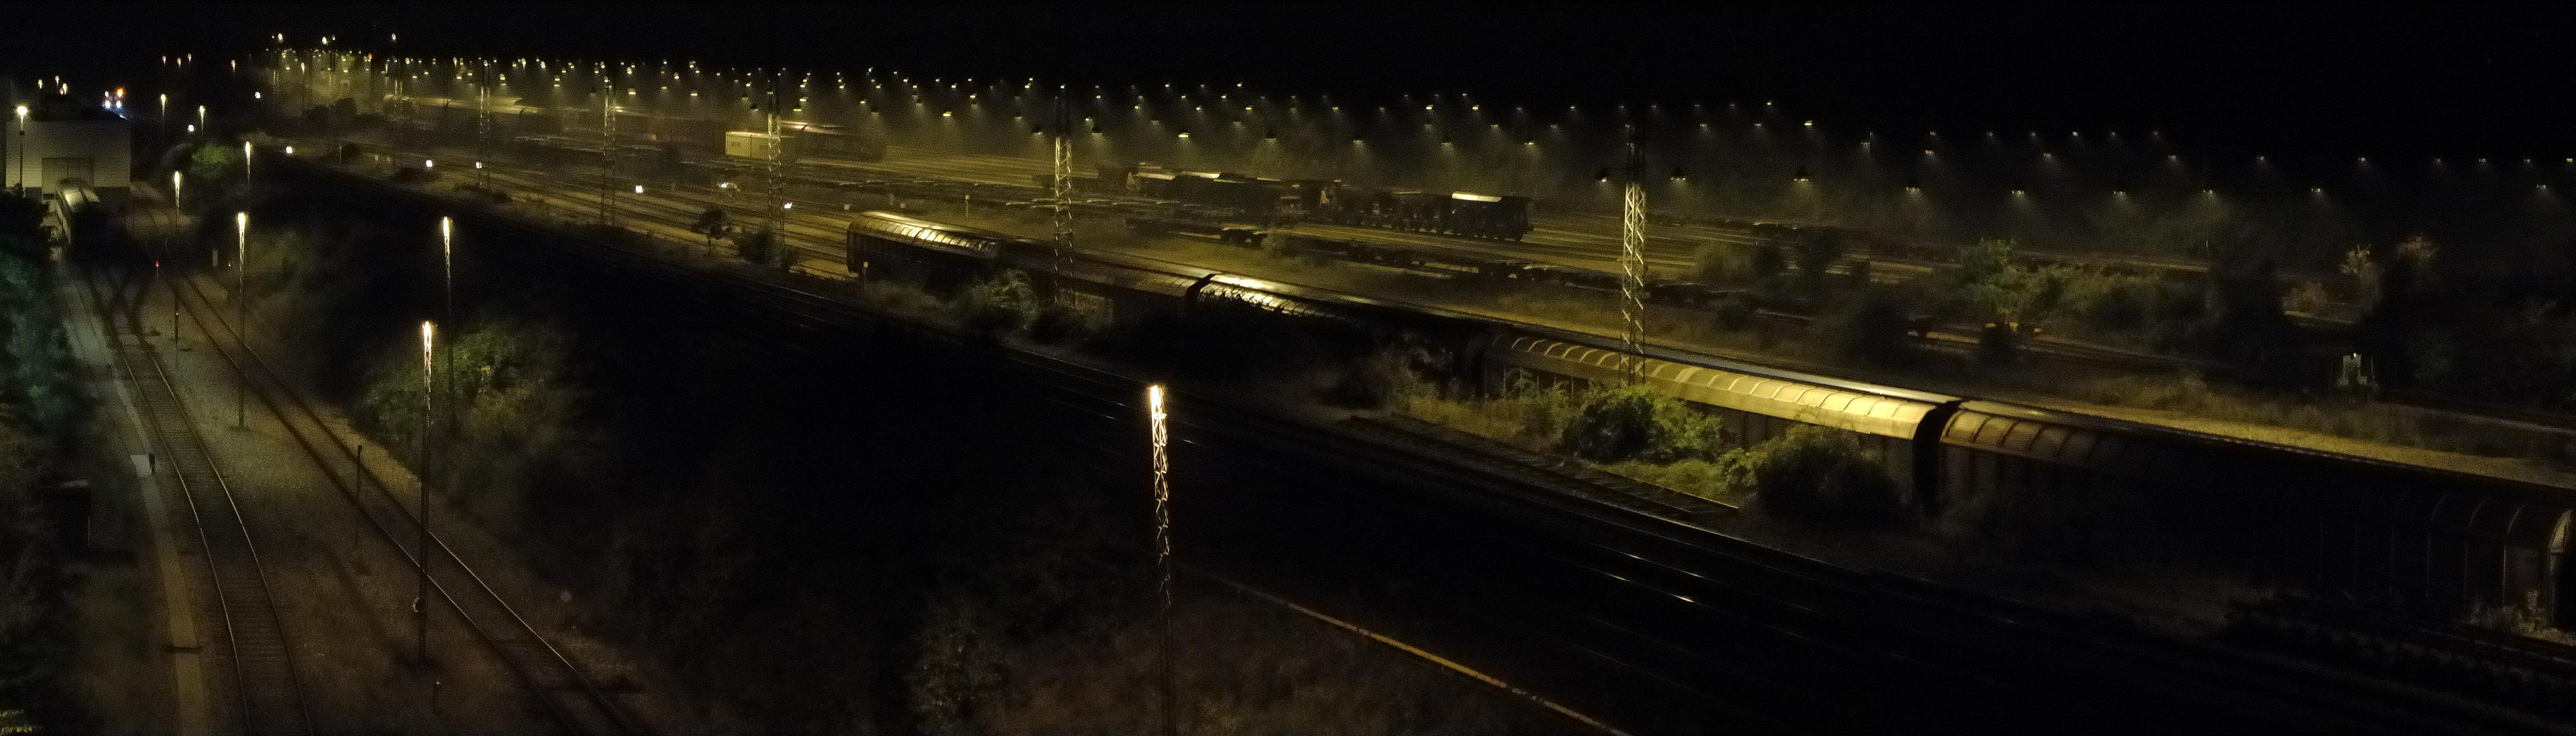 Lights at the trainyard, Bspo06, Light, Lights, Night, HQ Photo